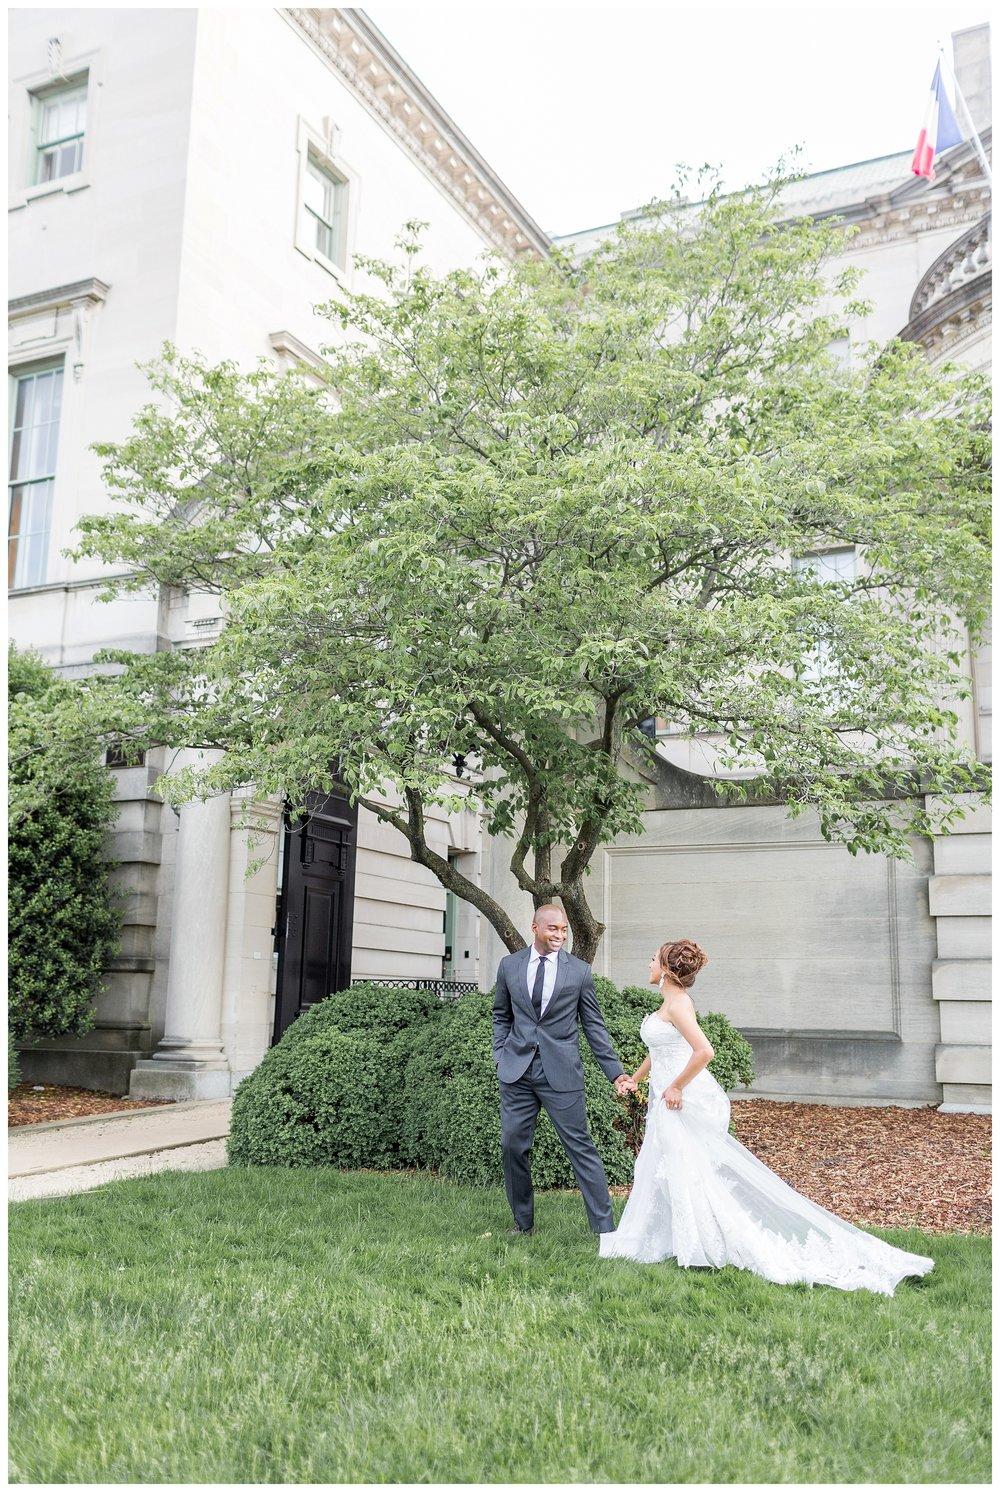 Anderson House Wedding DC Wedding Photographer Kir Tuben_0037.jpg